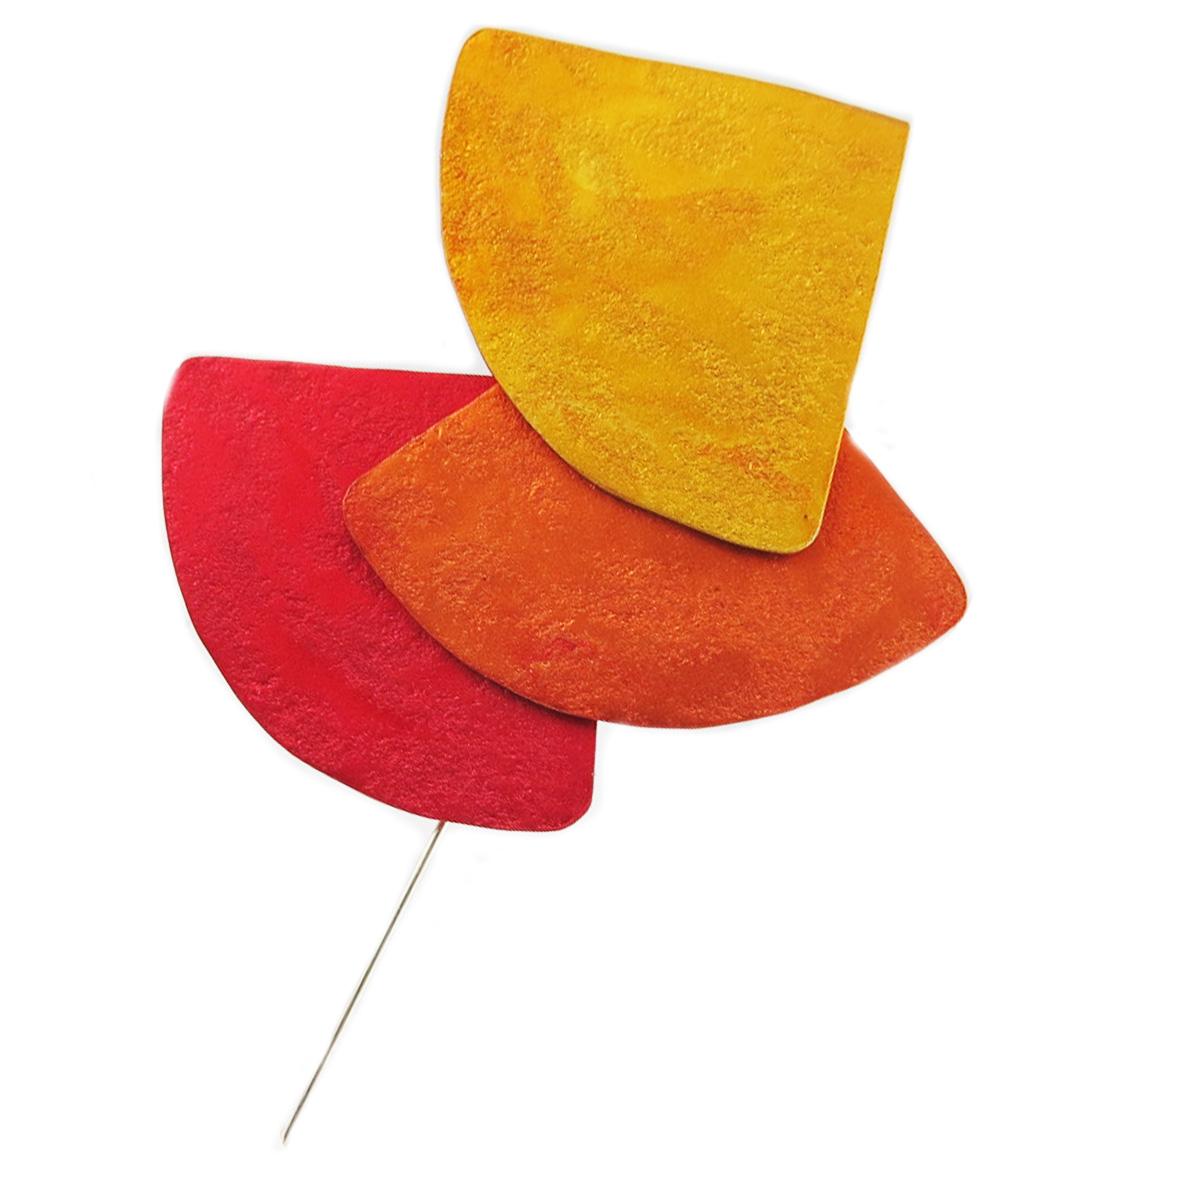 Broche fibule artisanale \'Aluminirock\' rouge orange jaune - 12 cm, 72x68 mm - [R1246]